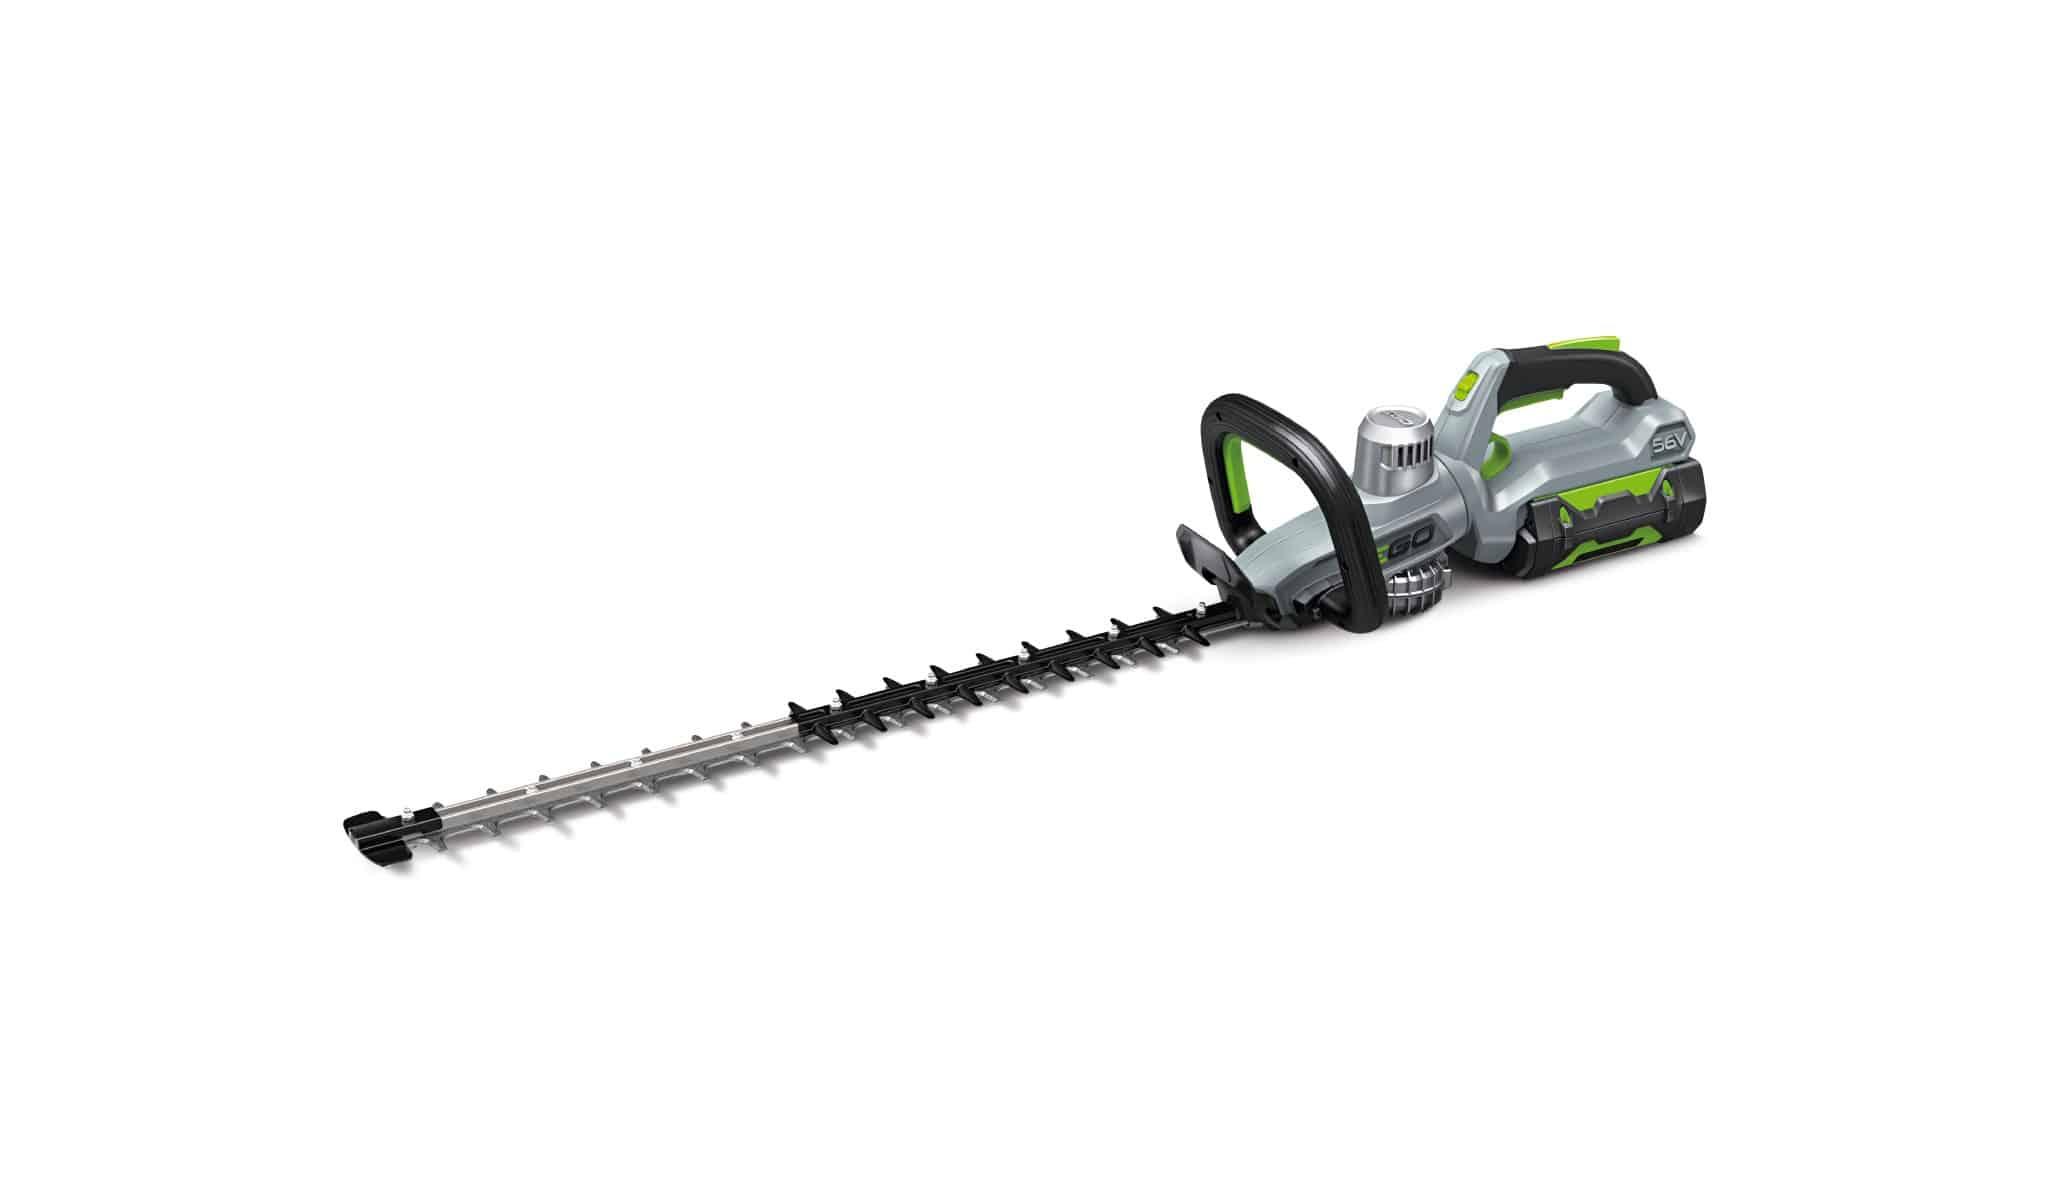 EGO HT6500E 65cm Cordless Hedge cutter